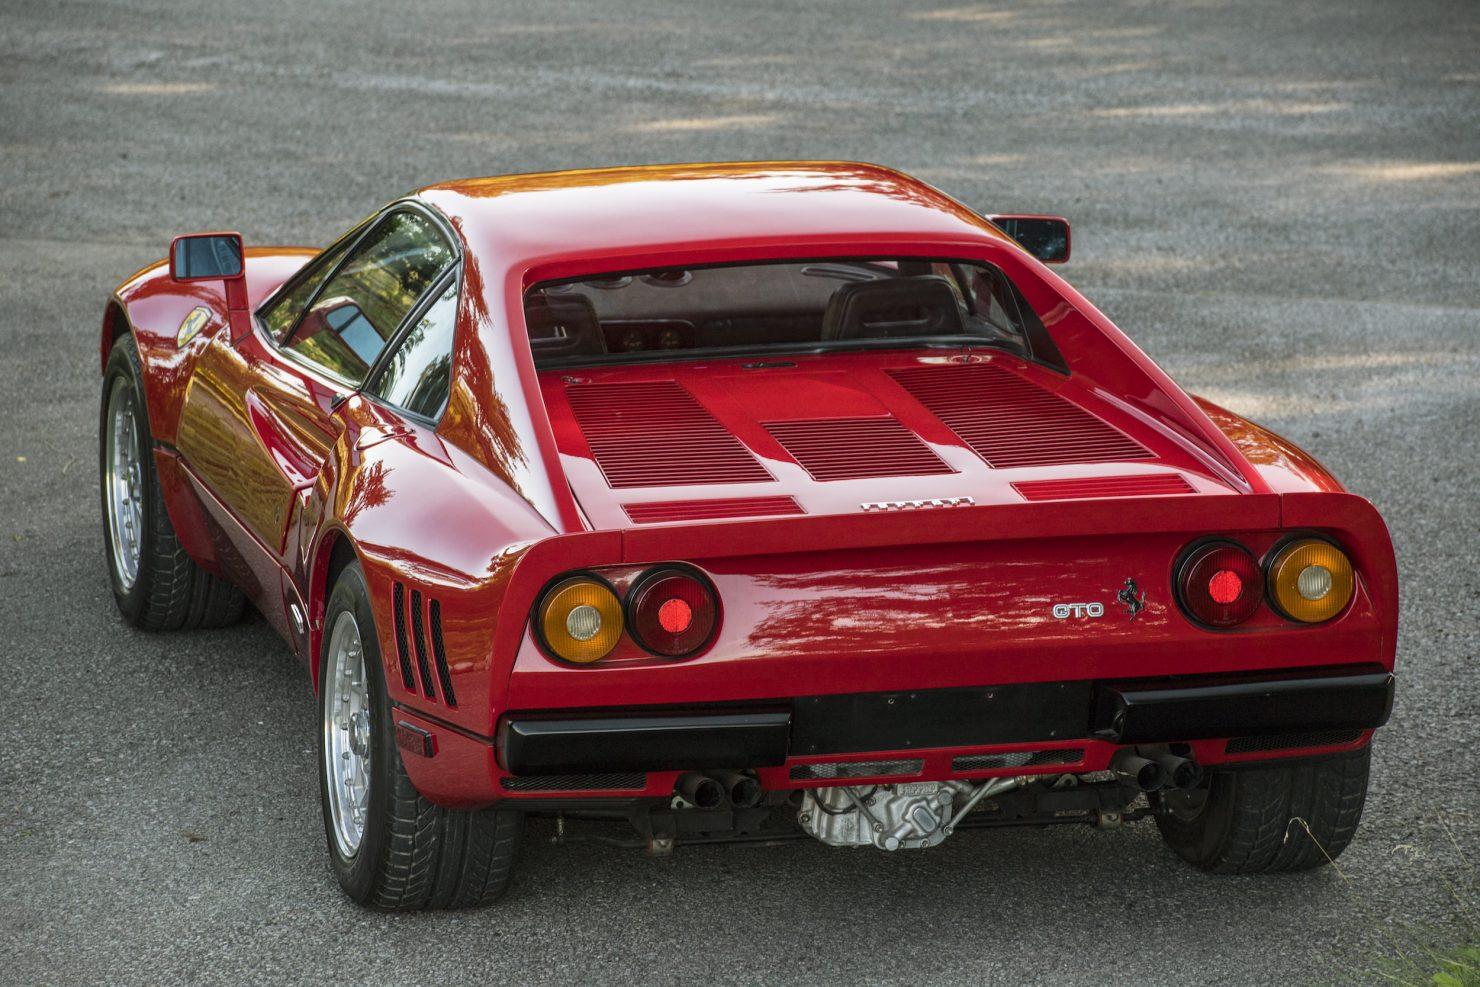 Ferrari 288 GTO 4 1480x987 - 1985 Ferrari 288 GTO